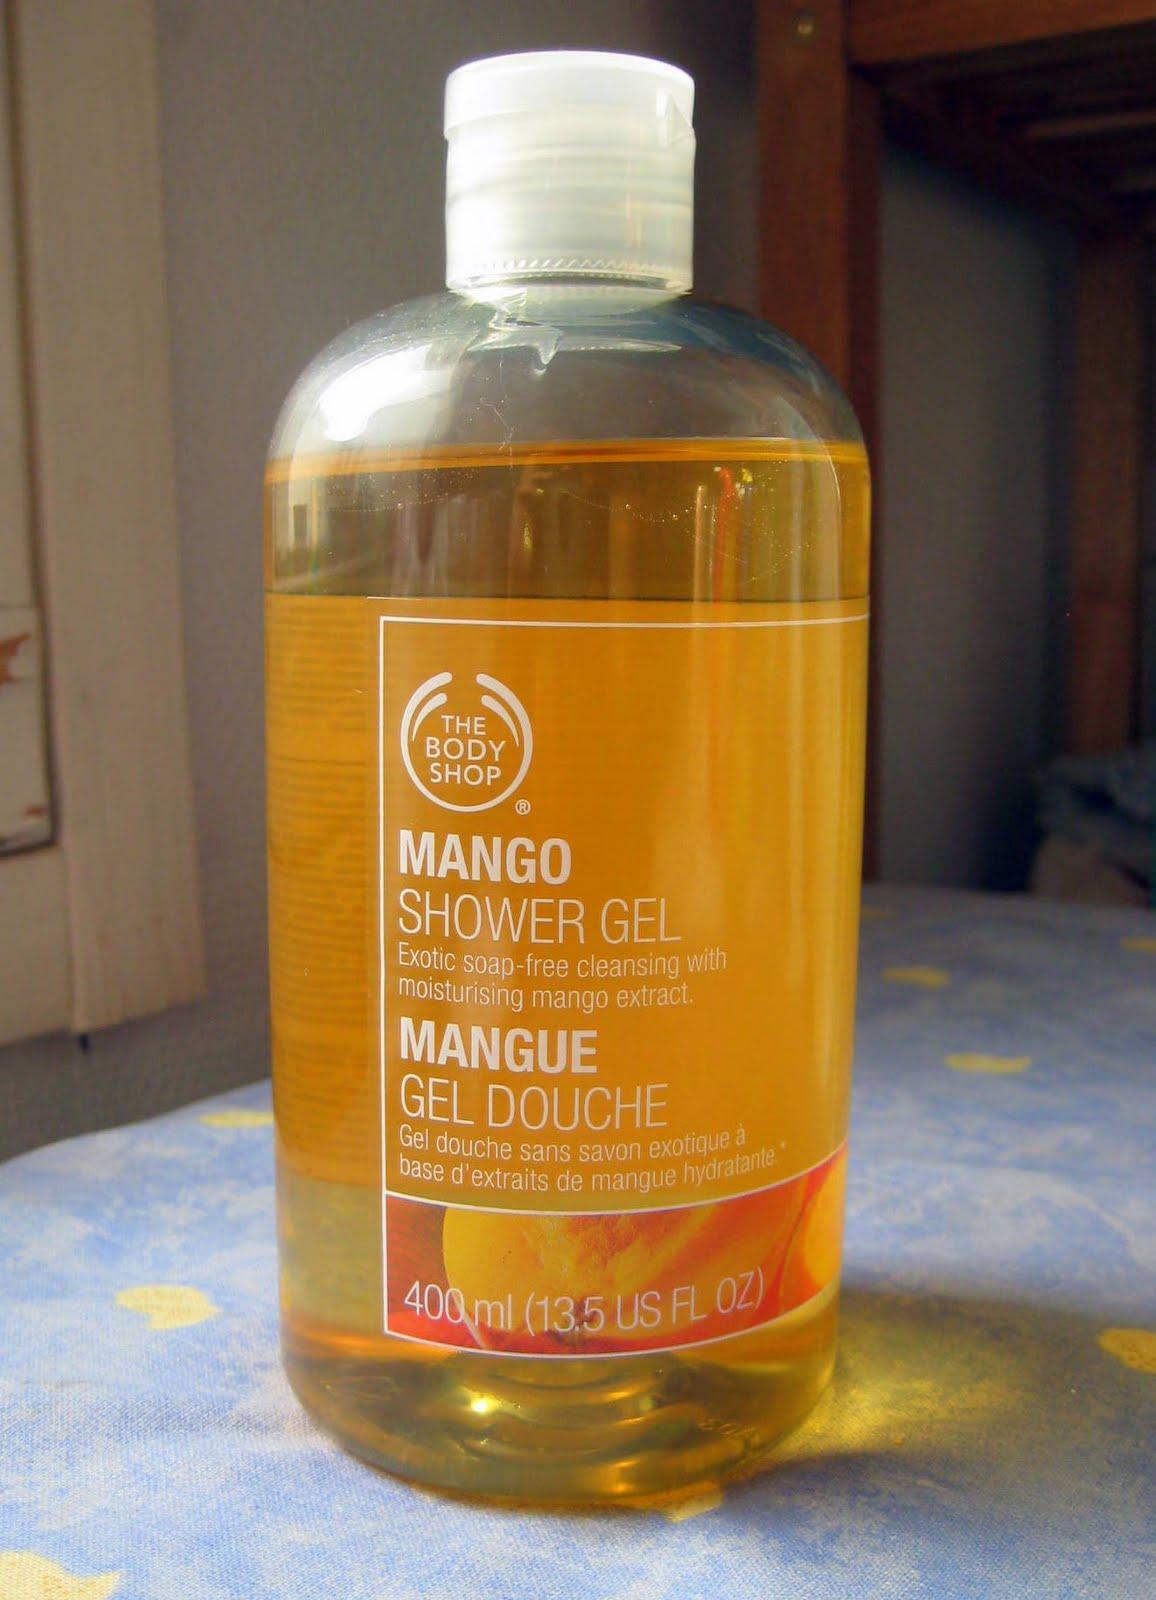 Vanilla kissemiss the body shop mango shower gel - The body shop mango shower gel ...